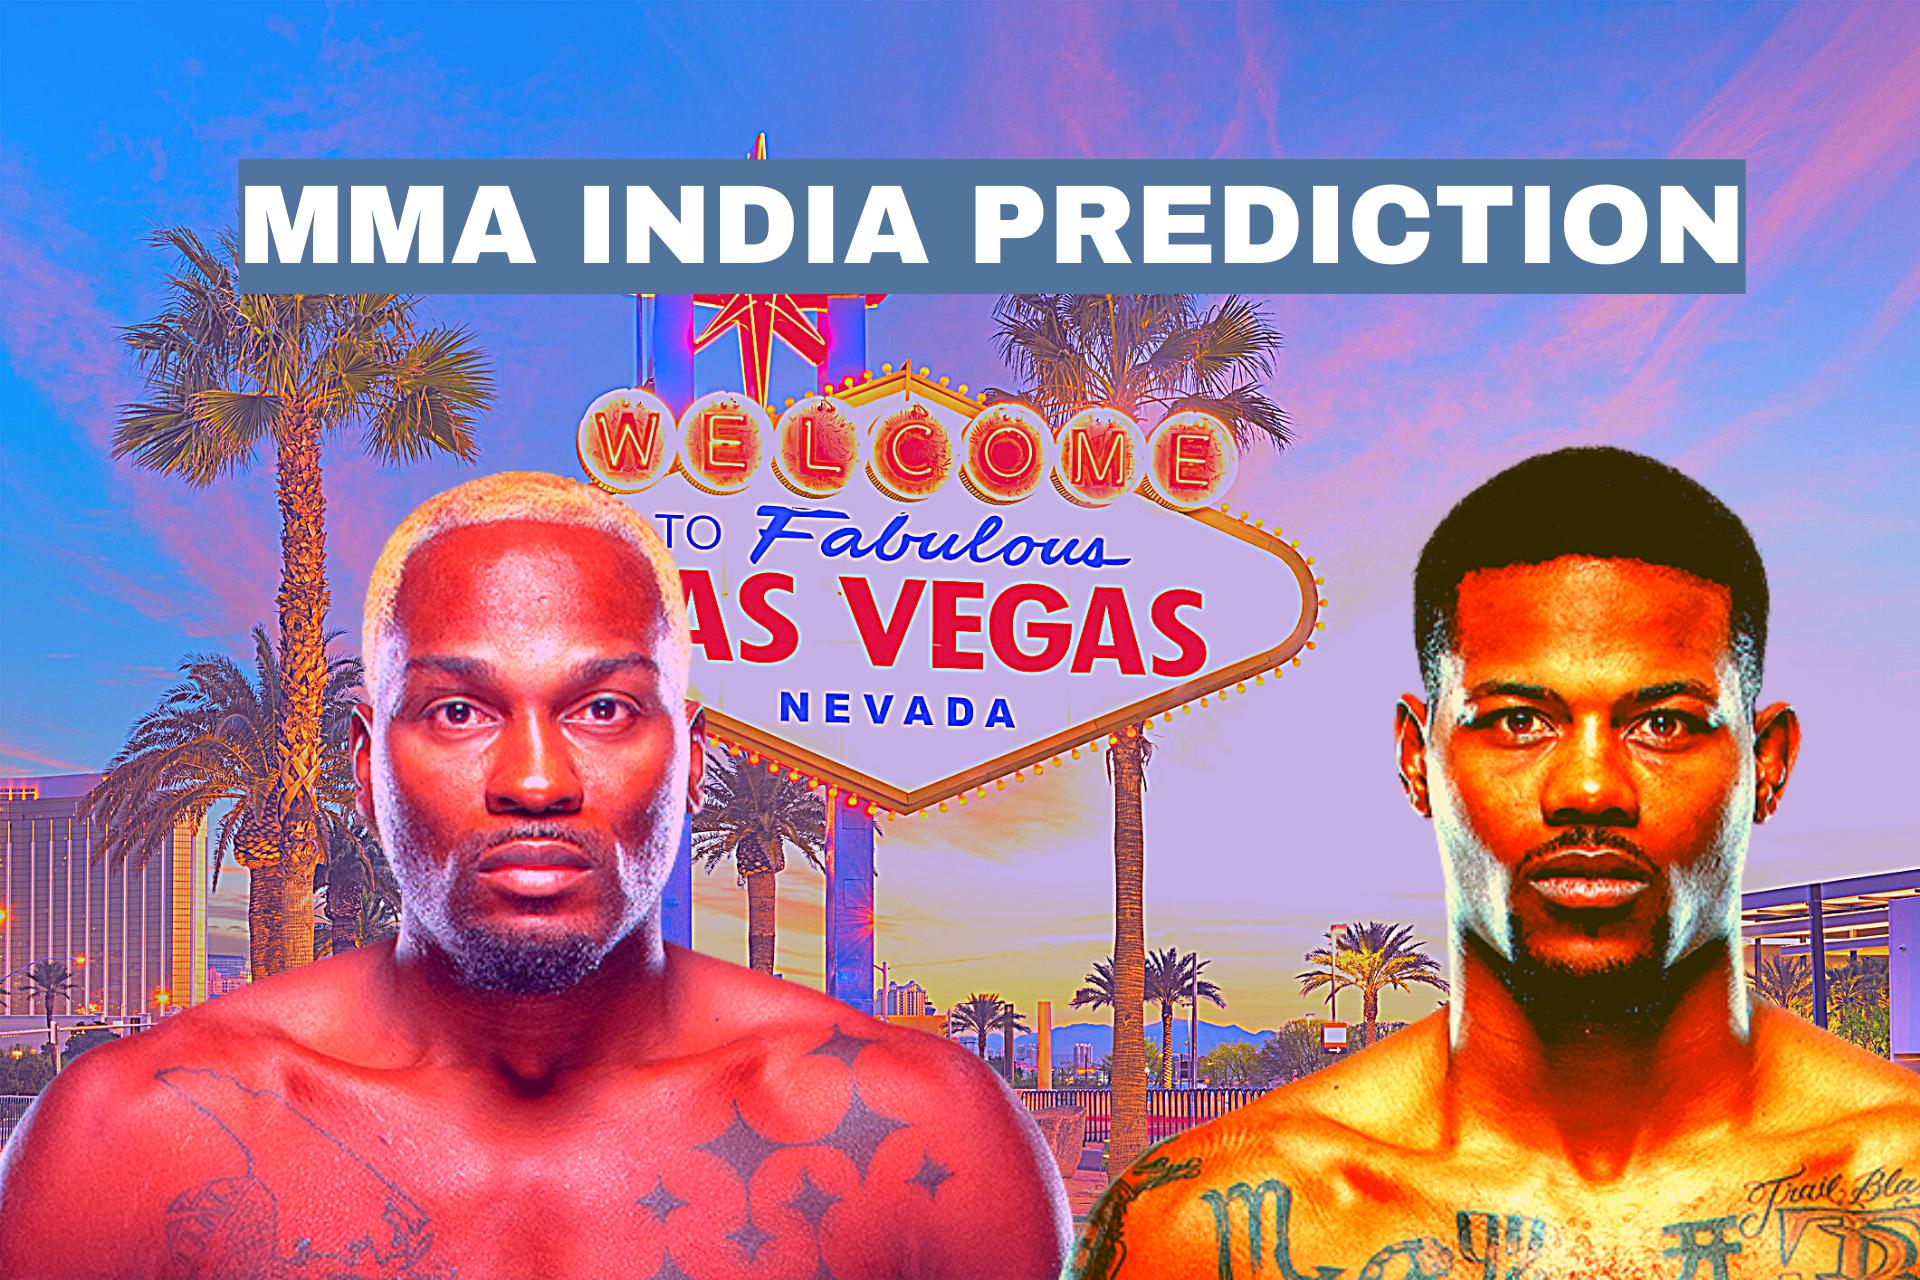 UFC Vegas 22: Brunson vs Holland betting odds and prediction - Holland